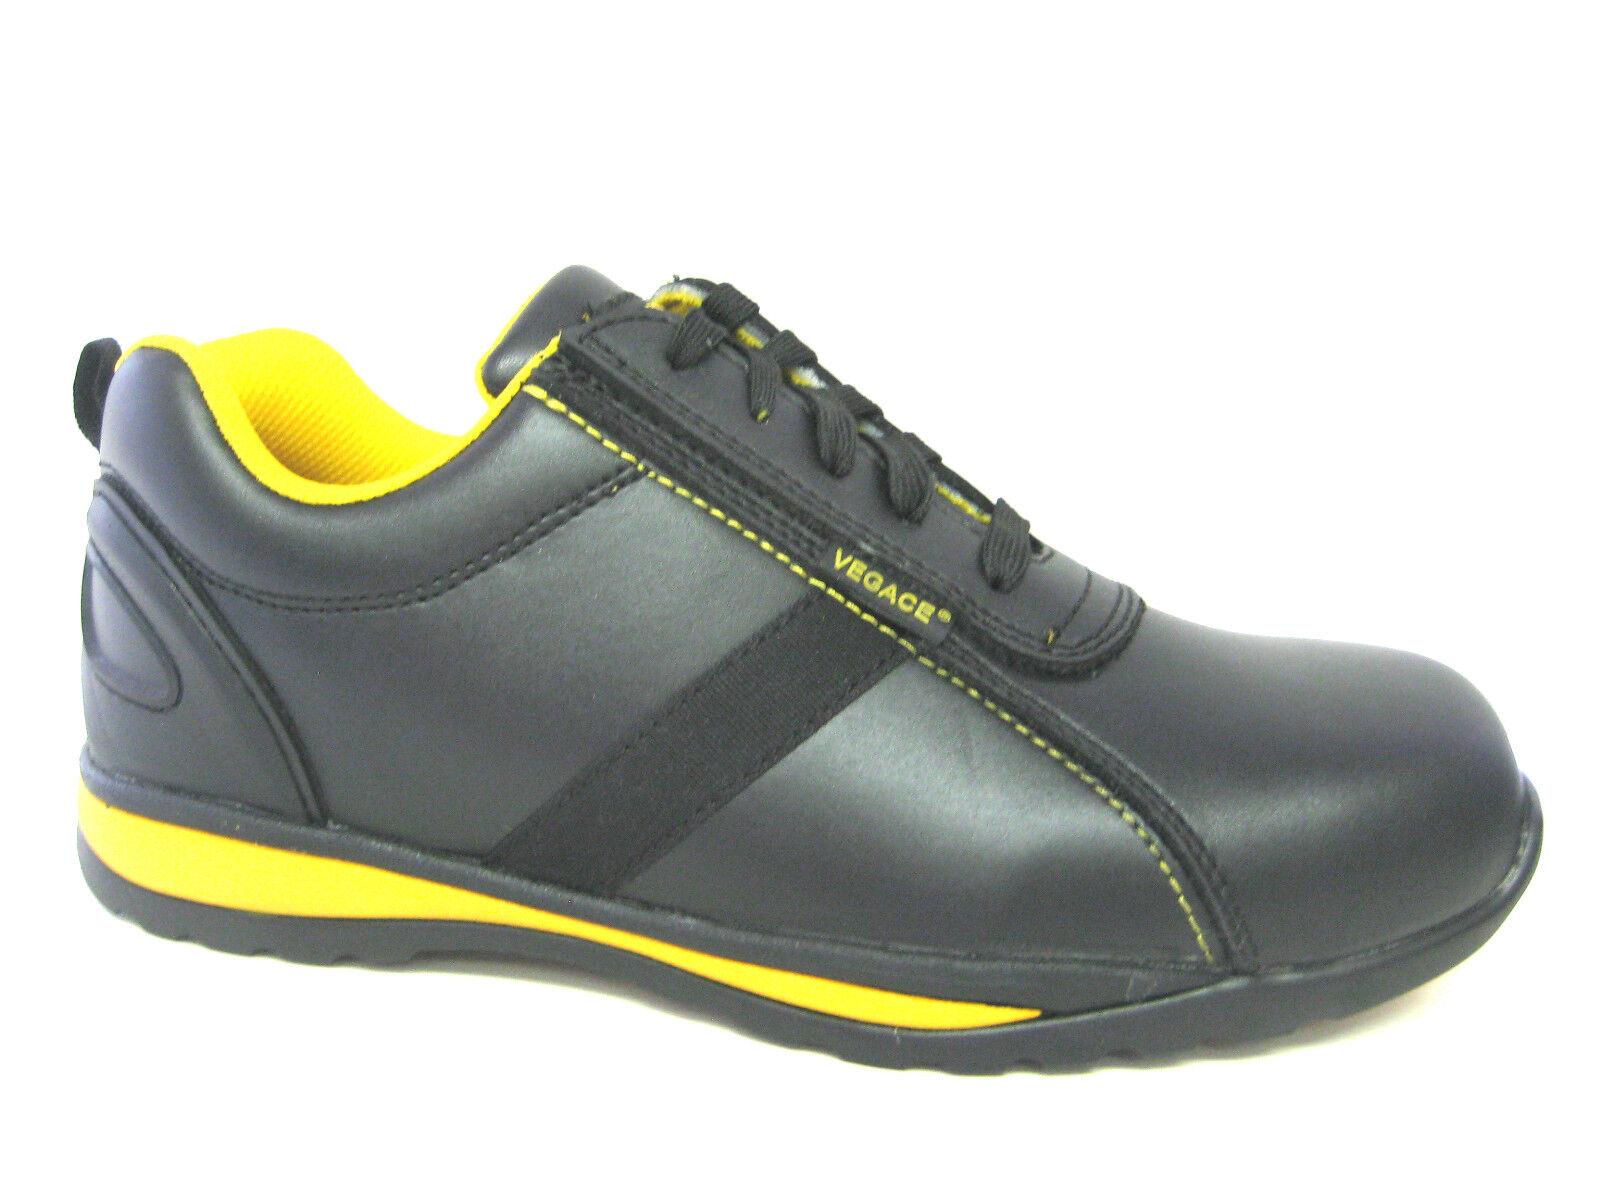 Vegace Men Composite SAFETY TOE Lightweight Leather Work shoes Oil Slip Resistant